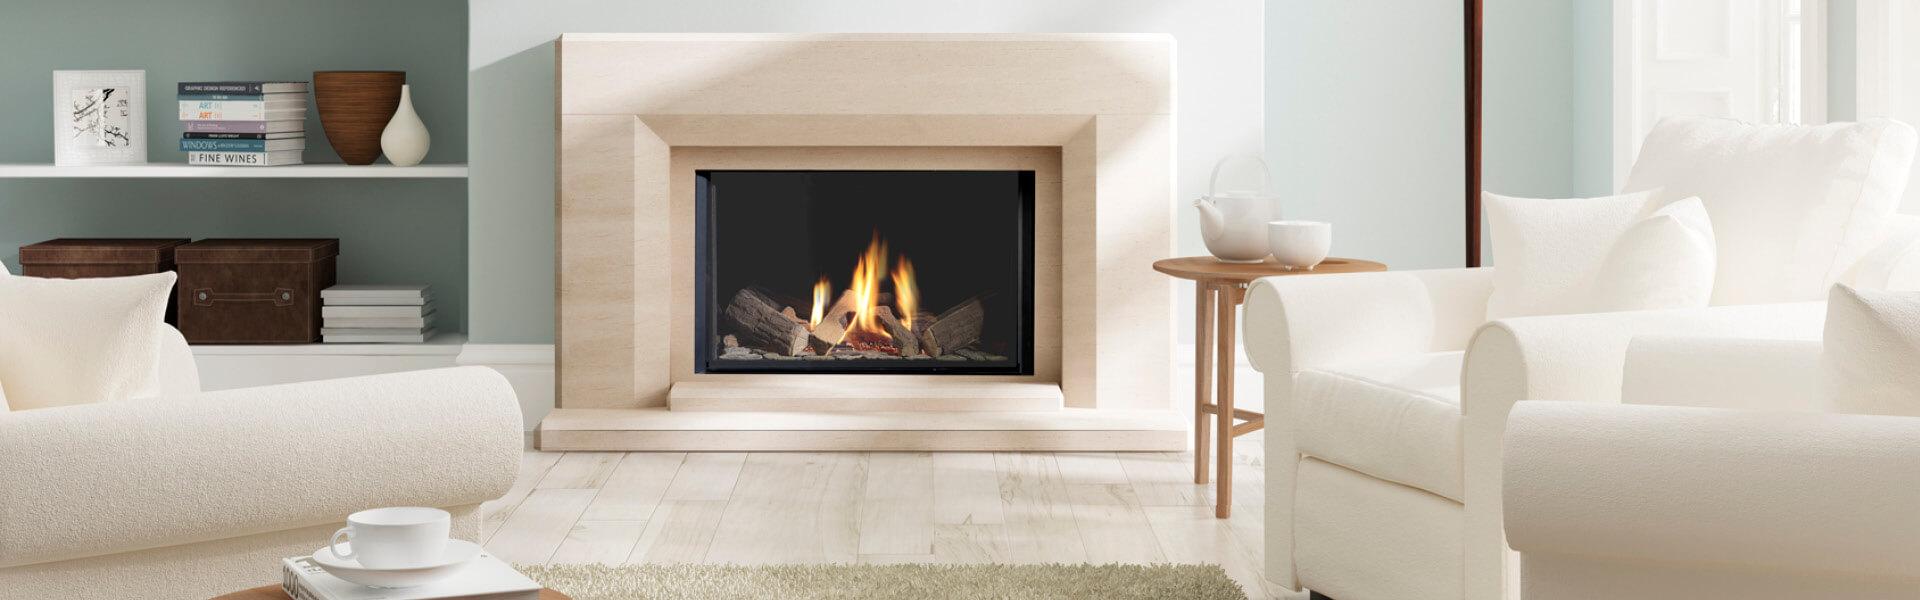 Fireplace Finesse Bourne